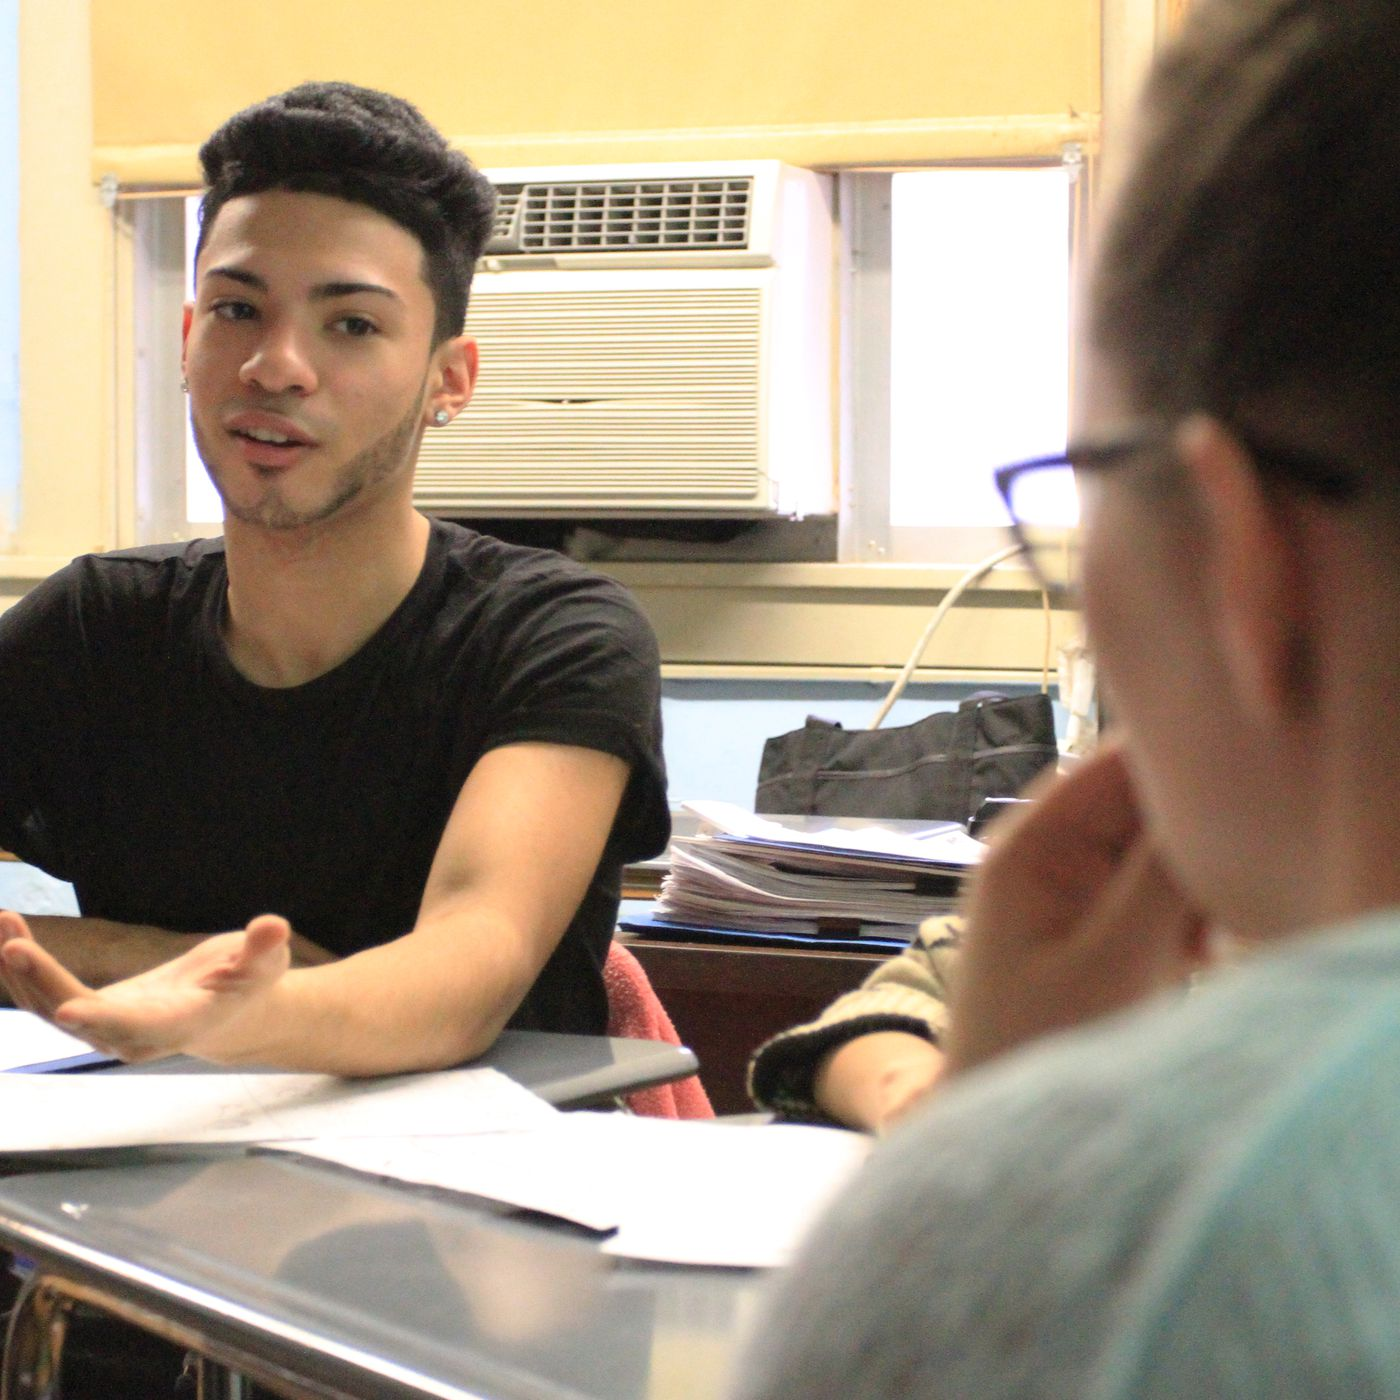 Nyc Cuts 75 000 Summer Jobs For Youth Amid Coronavirus Fallout Chalkbeat New York